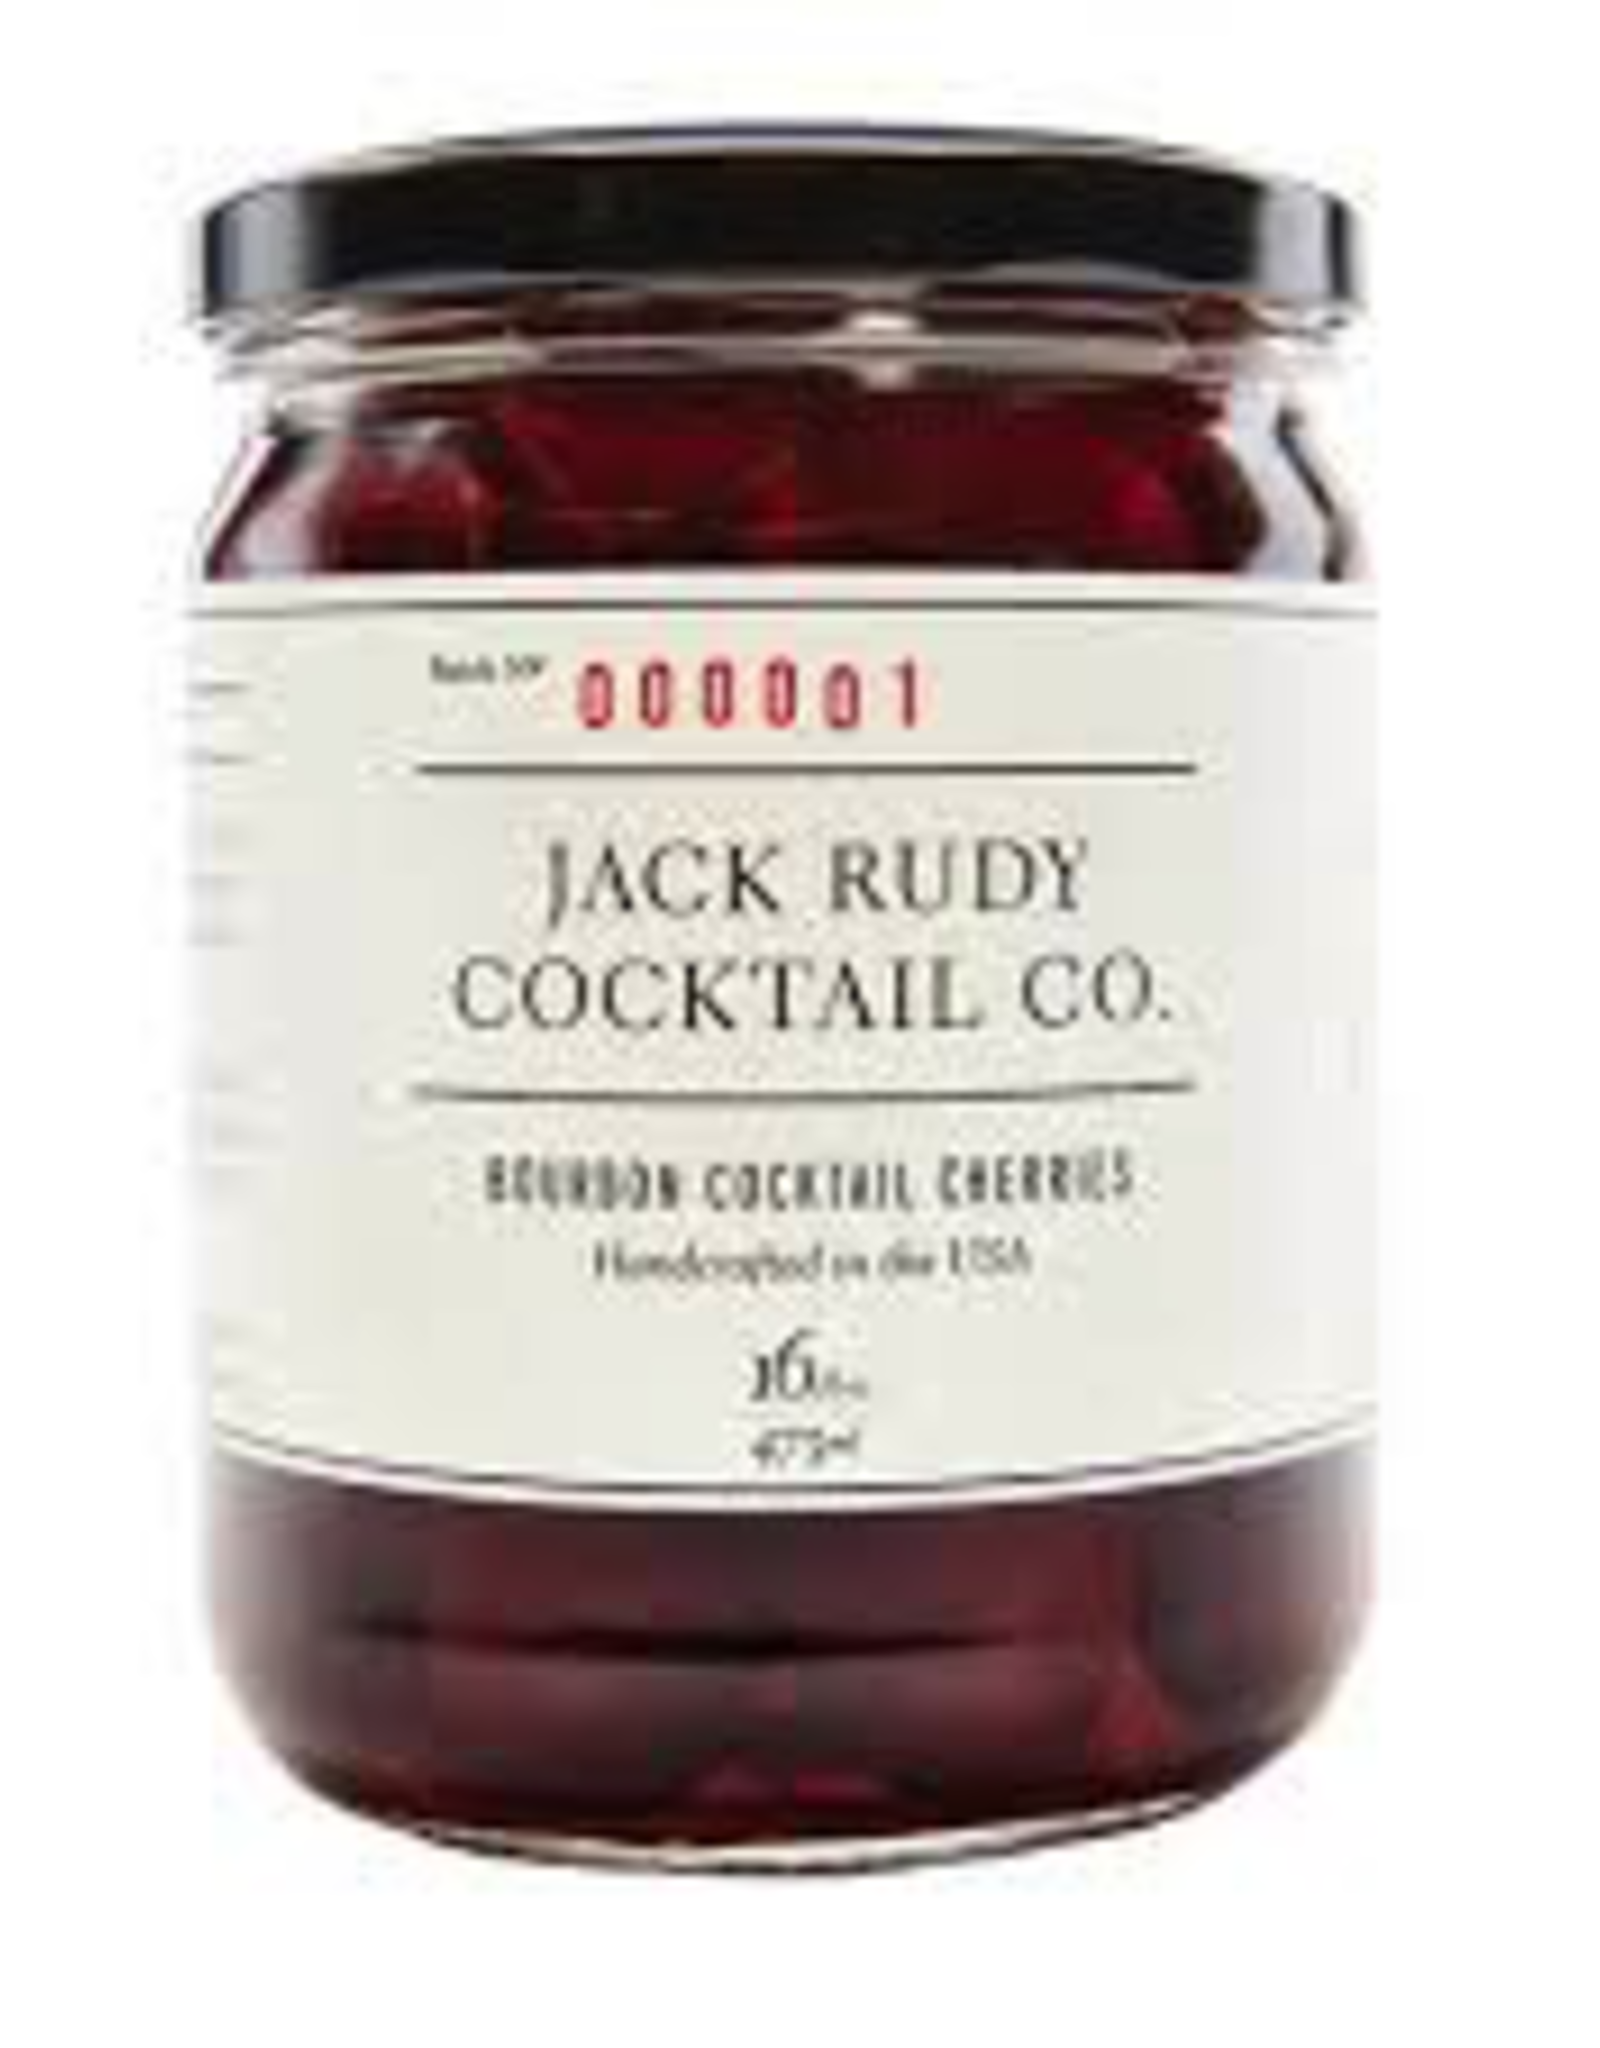 Jack Rudy Bourbon Cocktail Cherries 13.5oz.